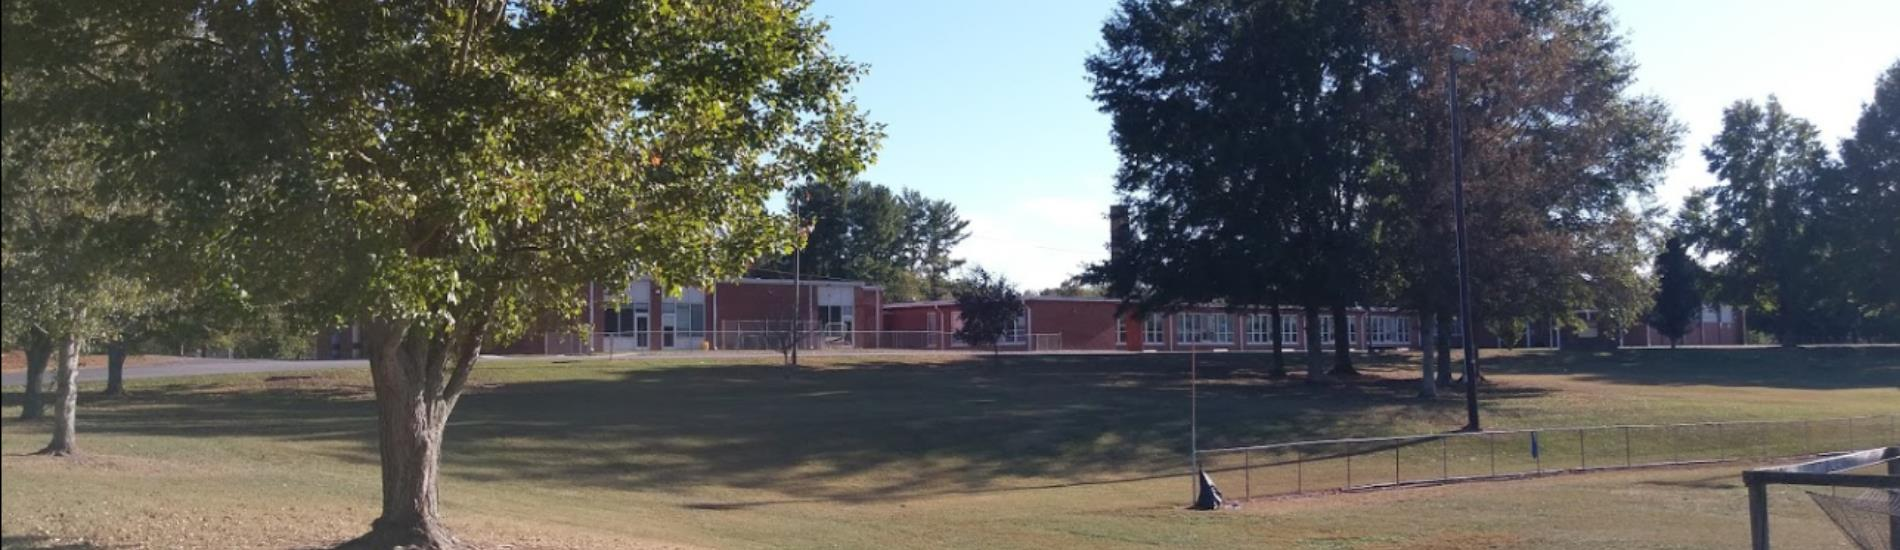 Surgoinsville Elementary School building